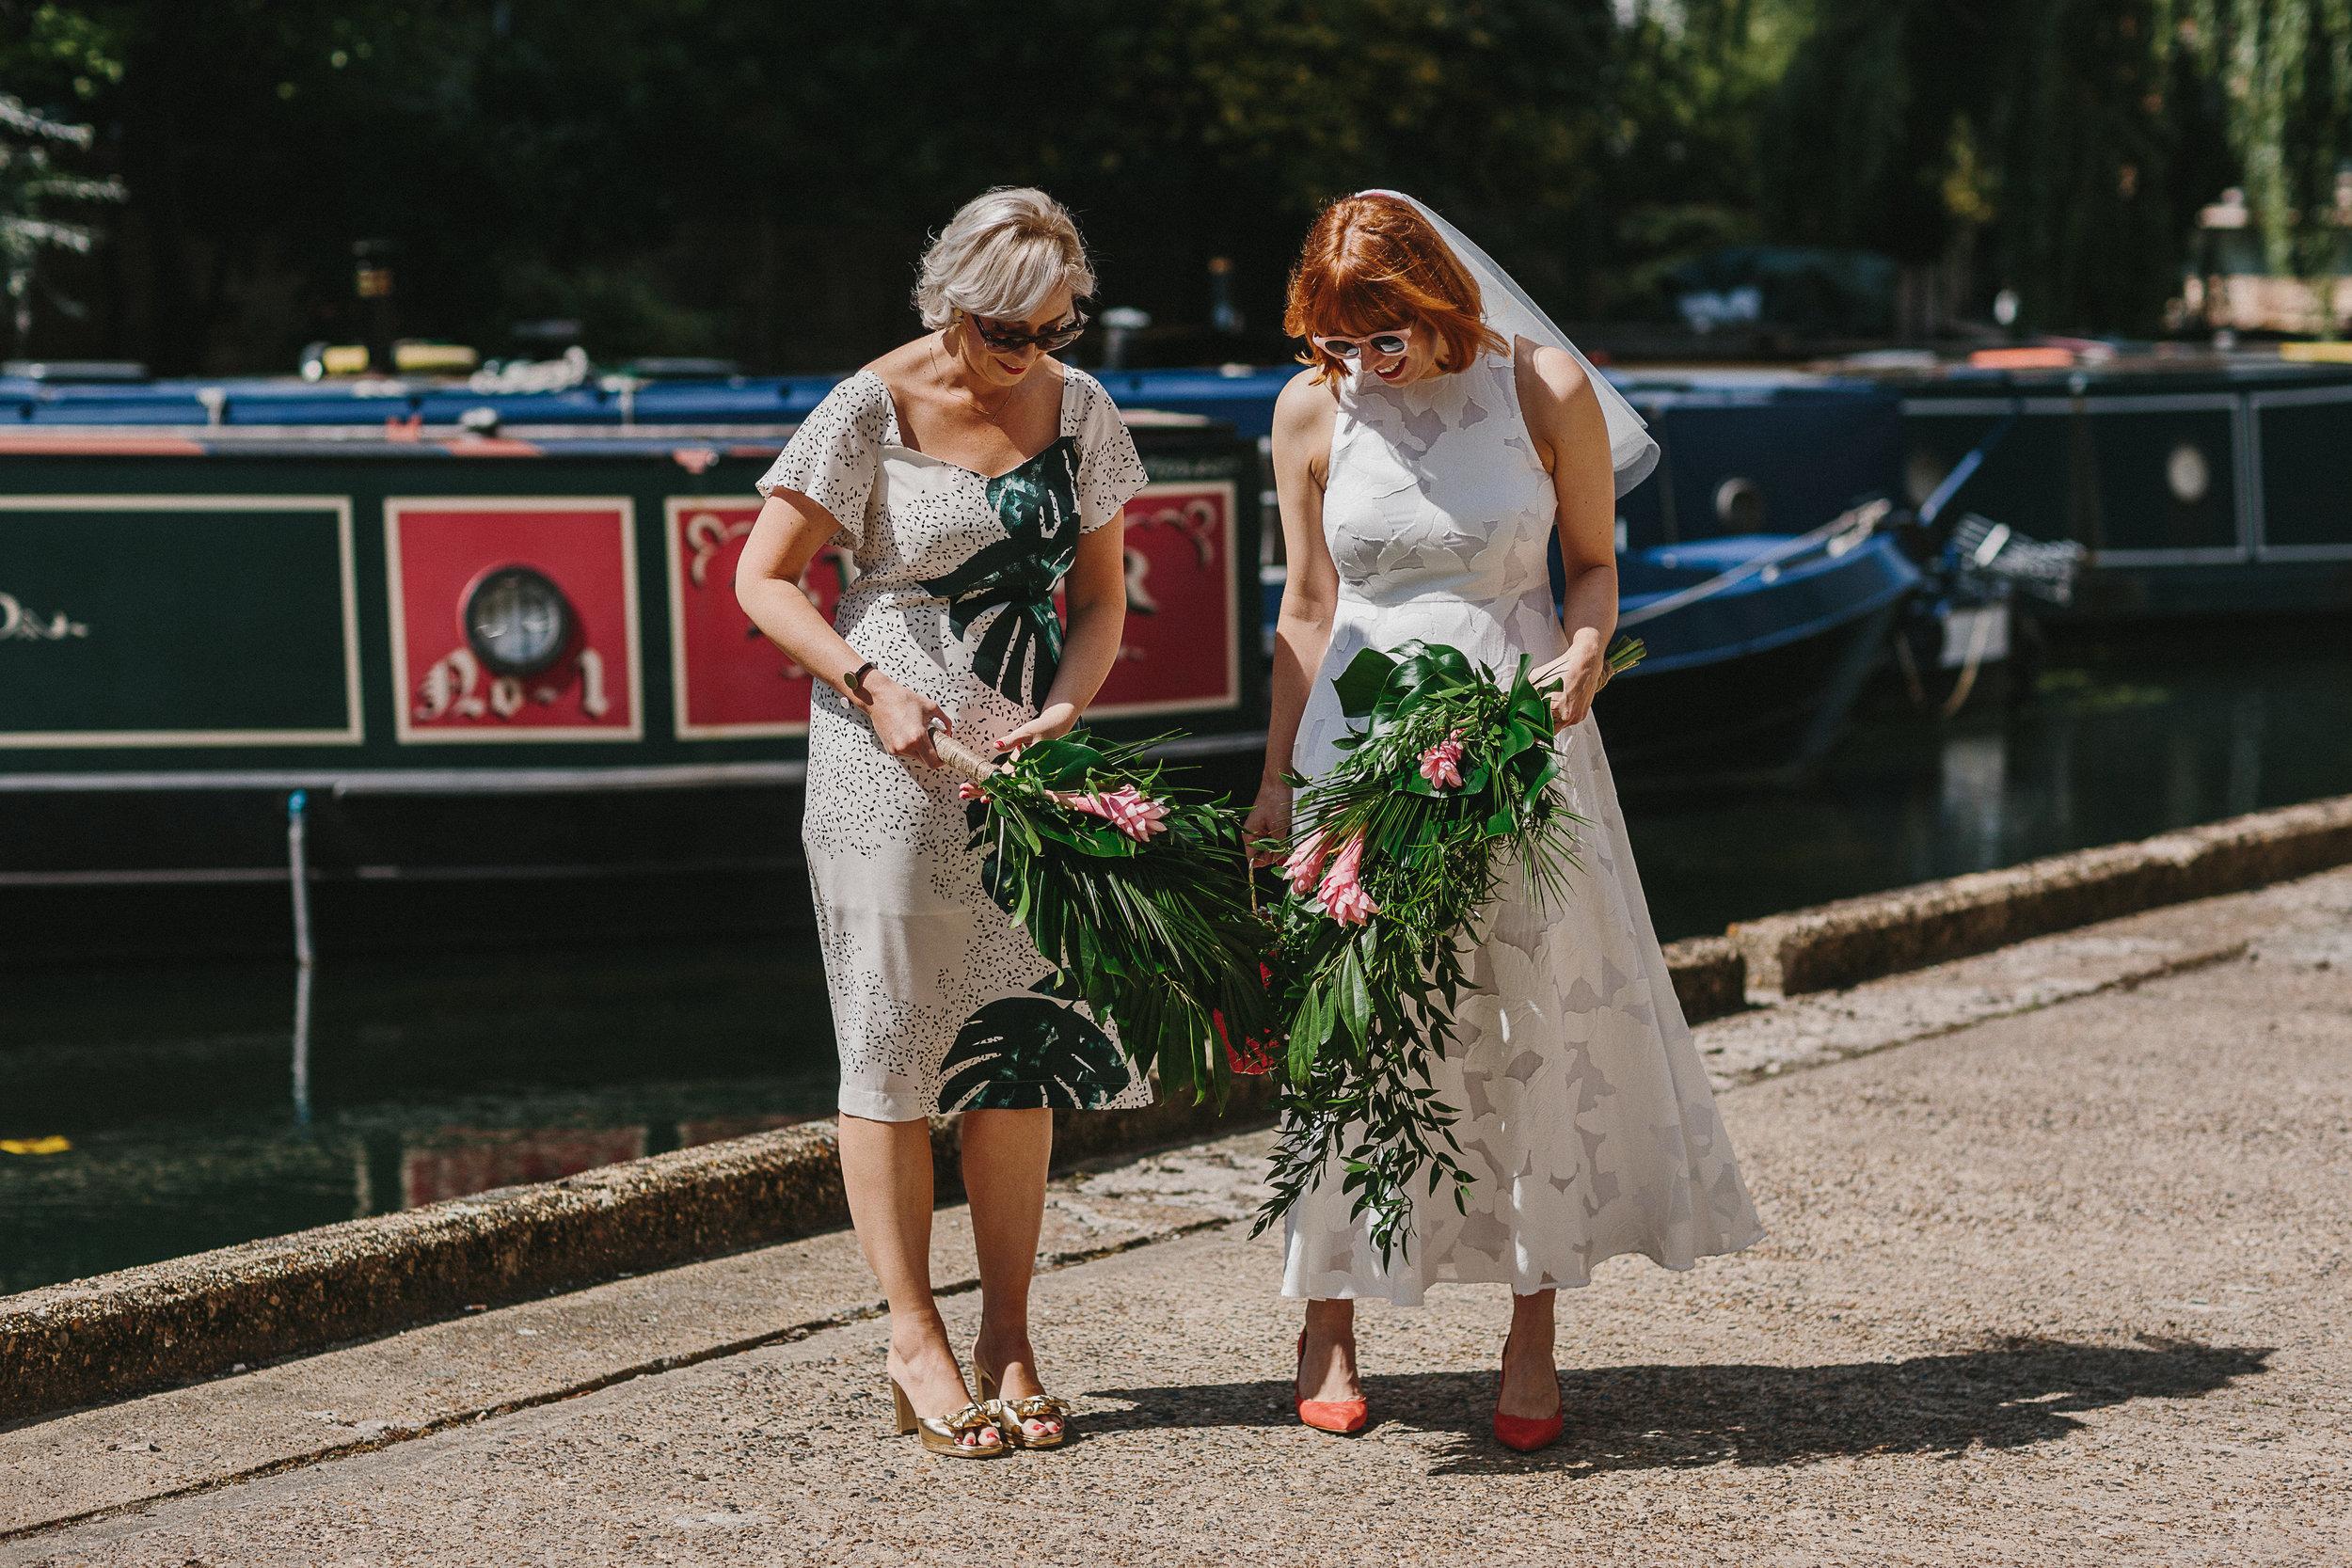 Islington_Town_Hall_Wedding_13.JPG